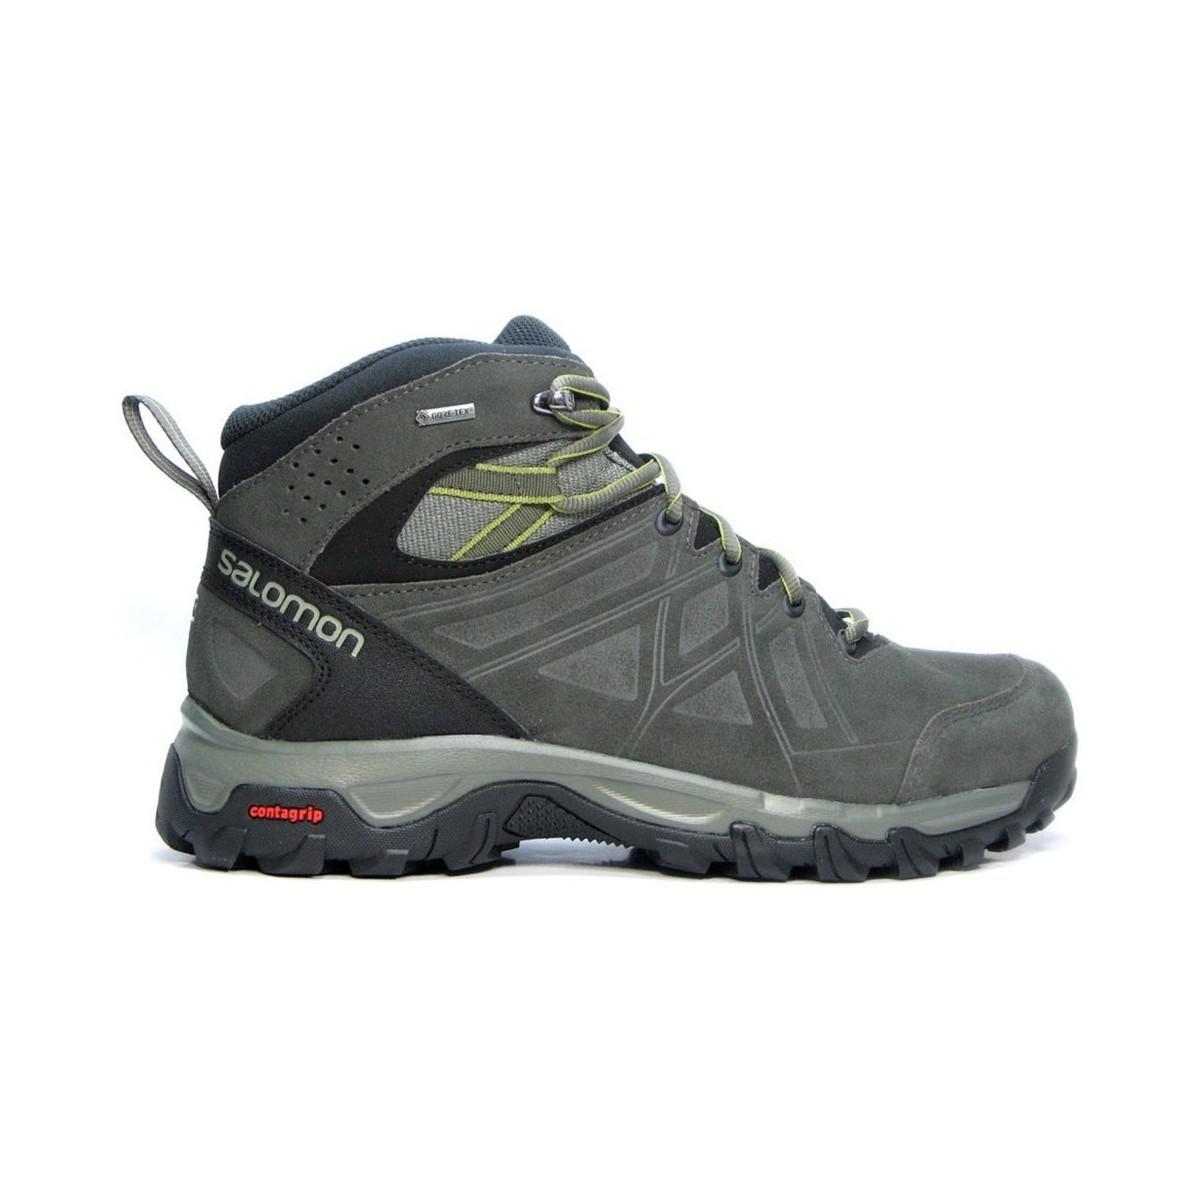 Salomon Men's EVASION 2 MID LTR GTX Hiking and Multisport